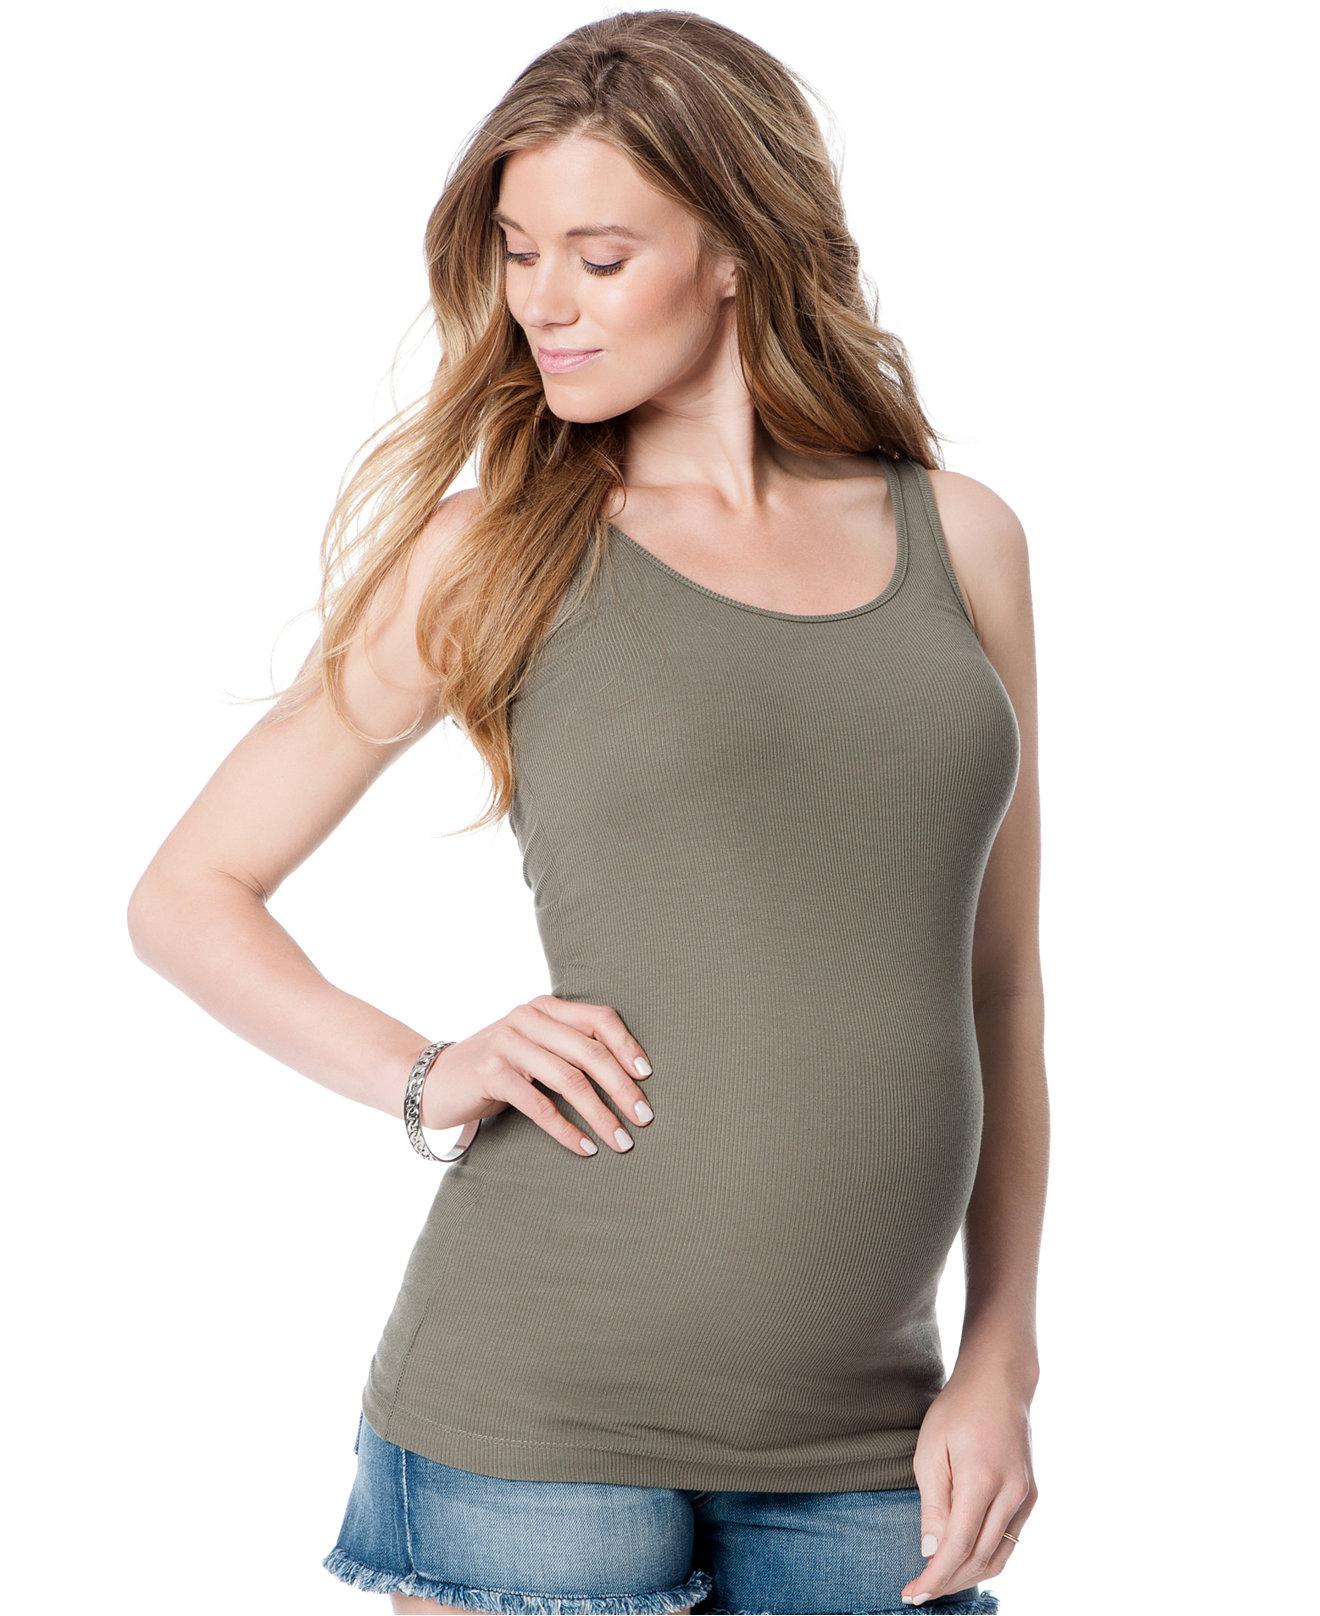 Maternity Tank Top from Macys